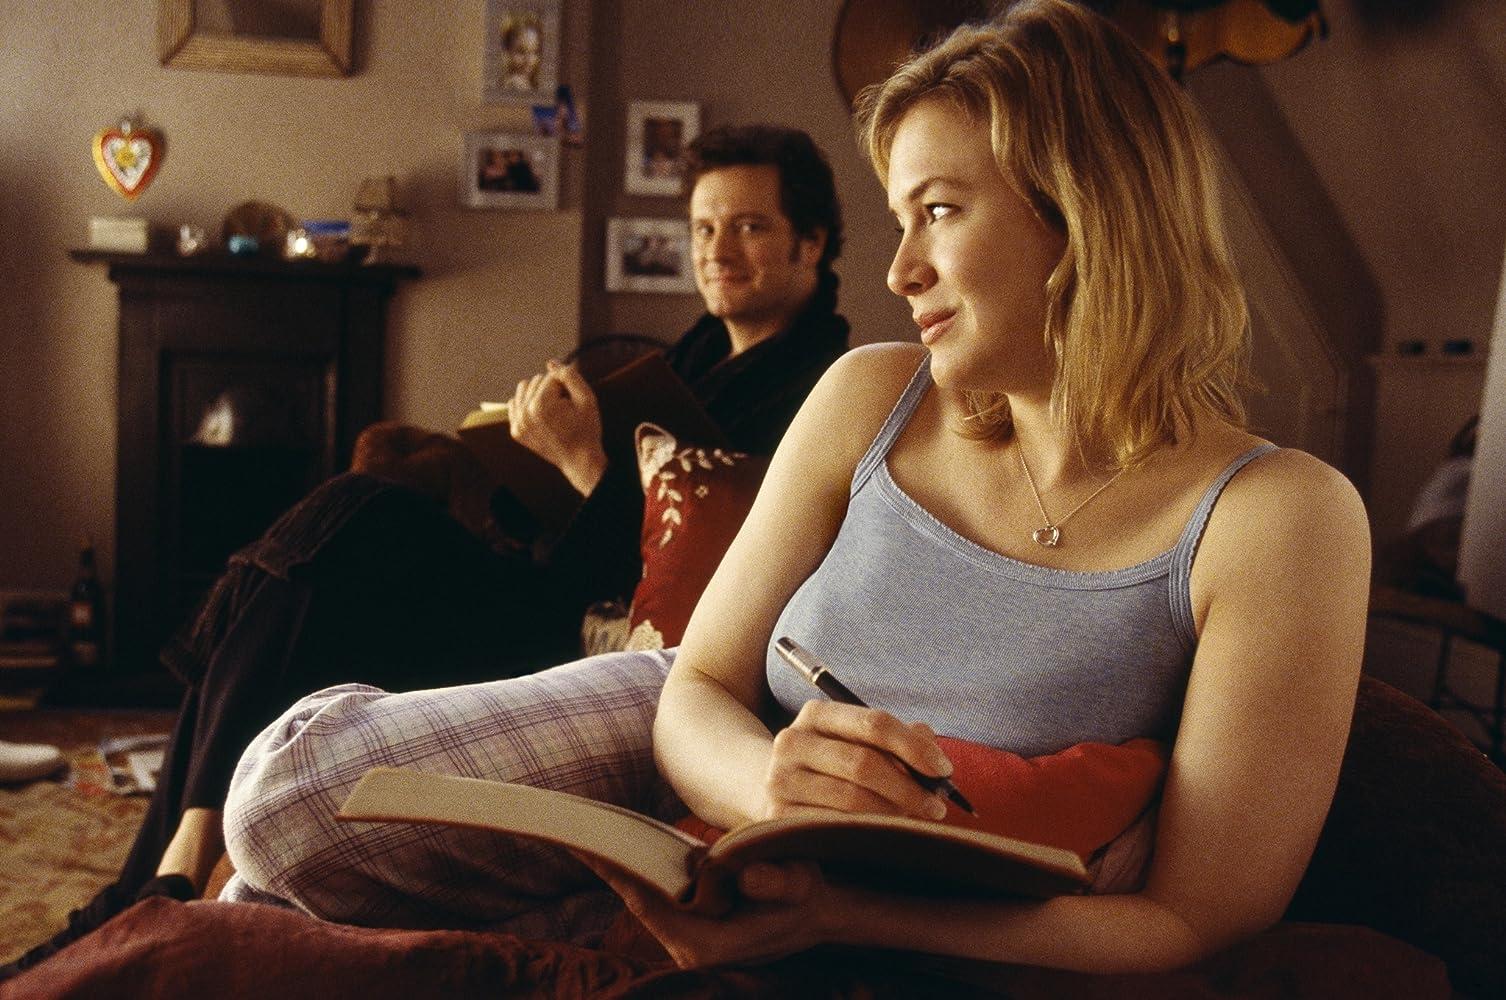 Colin Firth and Renée Zellweger in Bridget Jones: The Edge of Reason (2004)